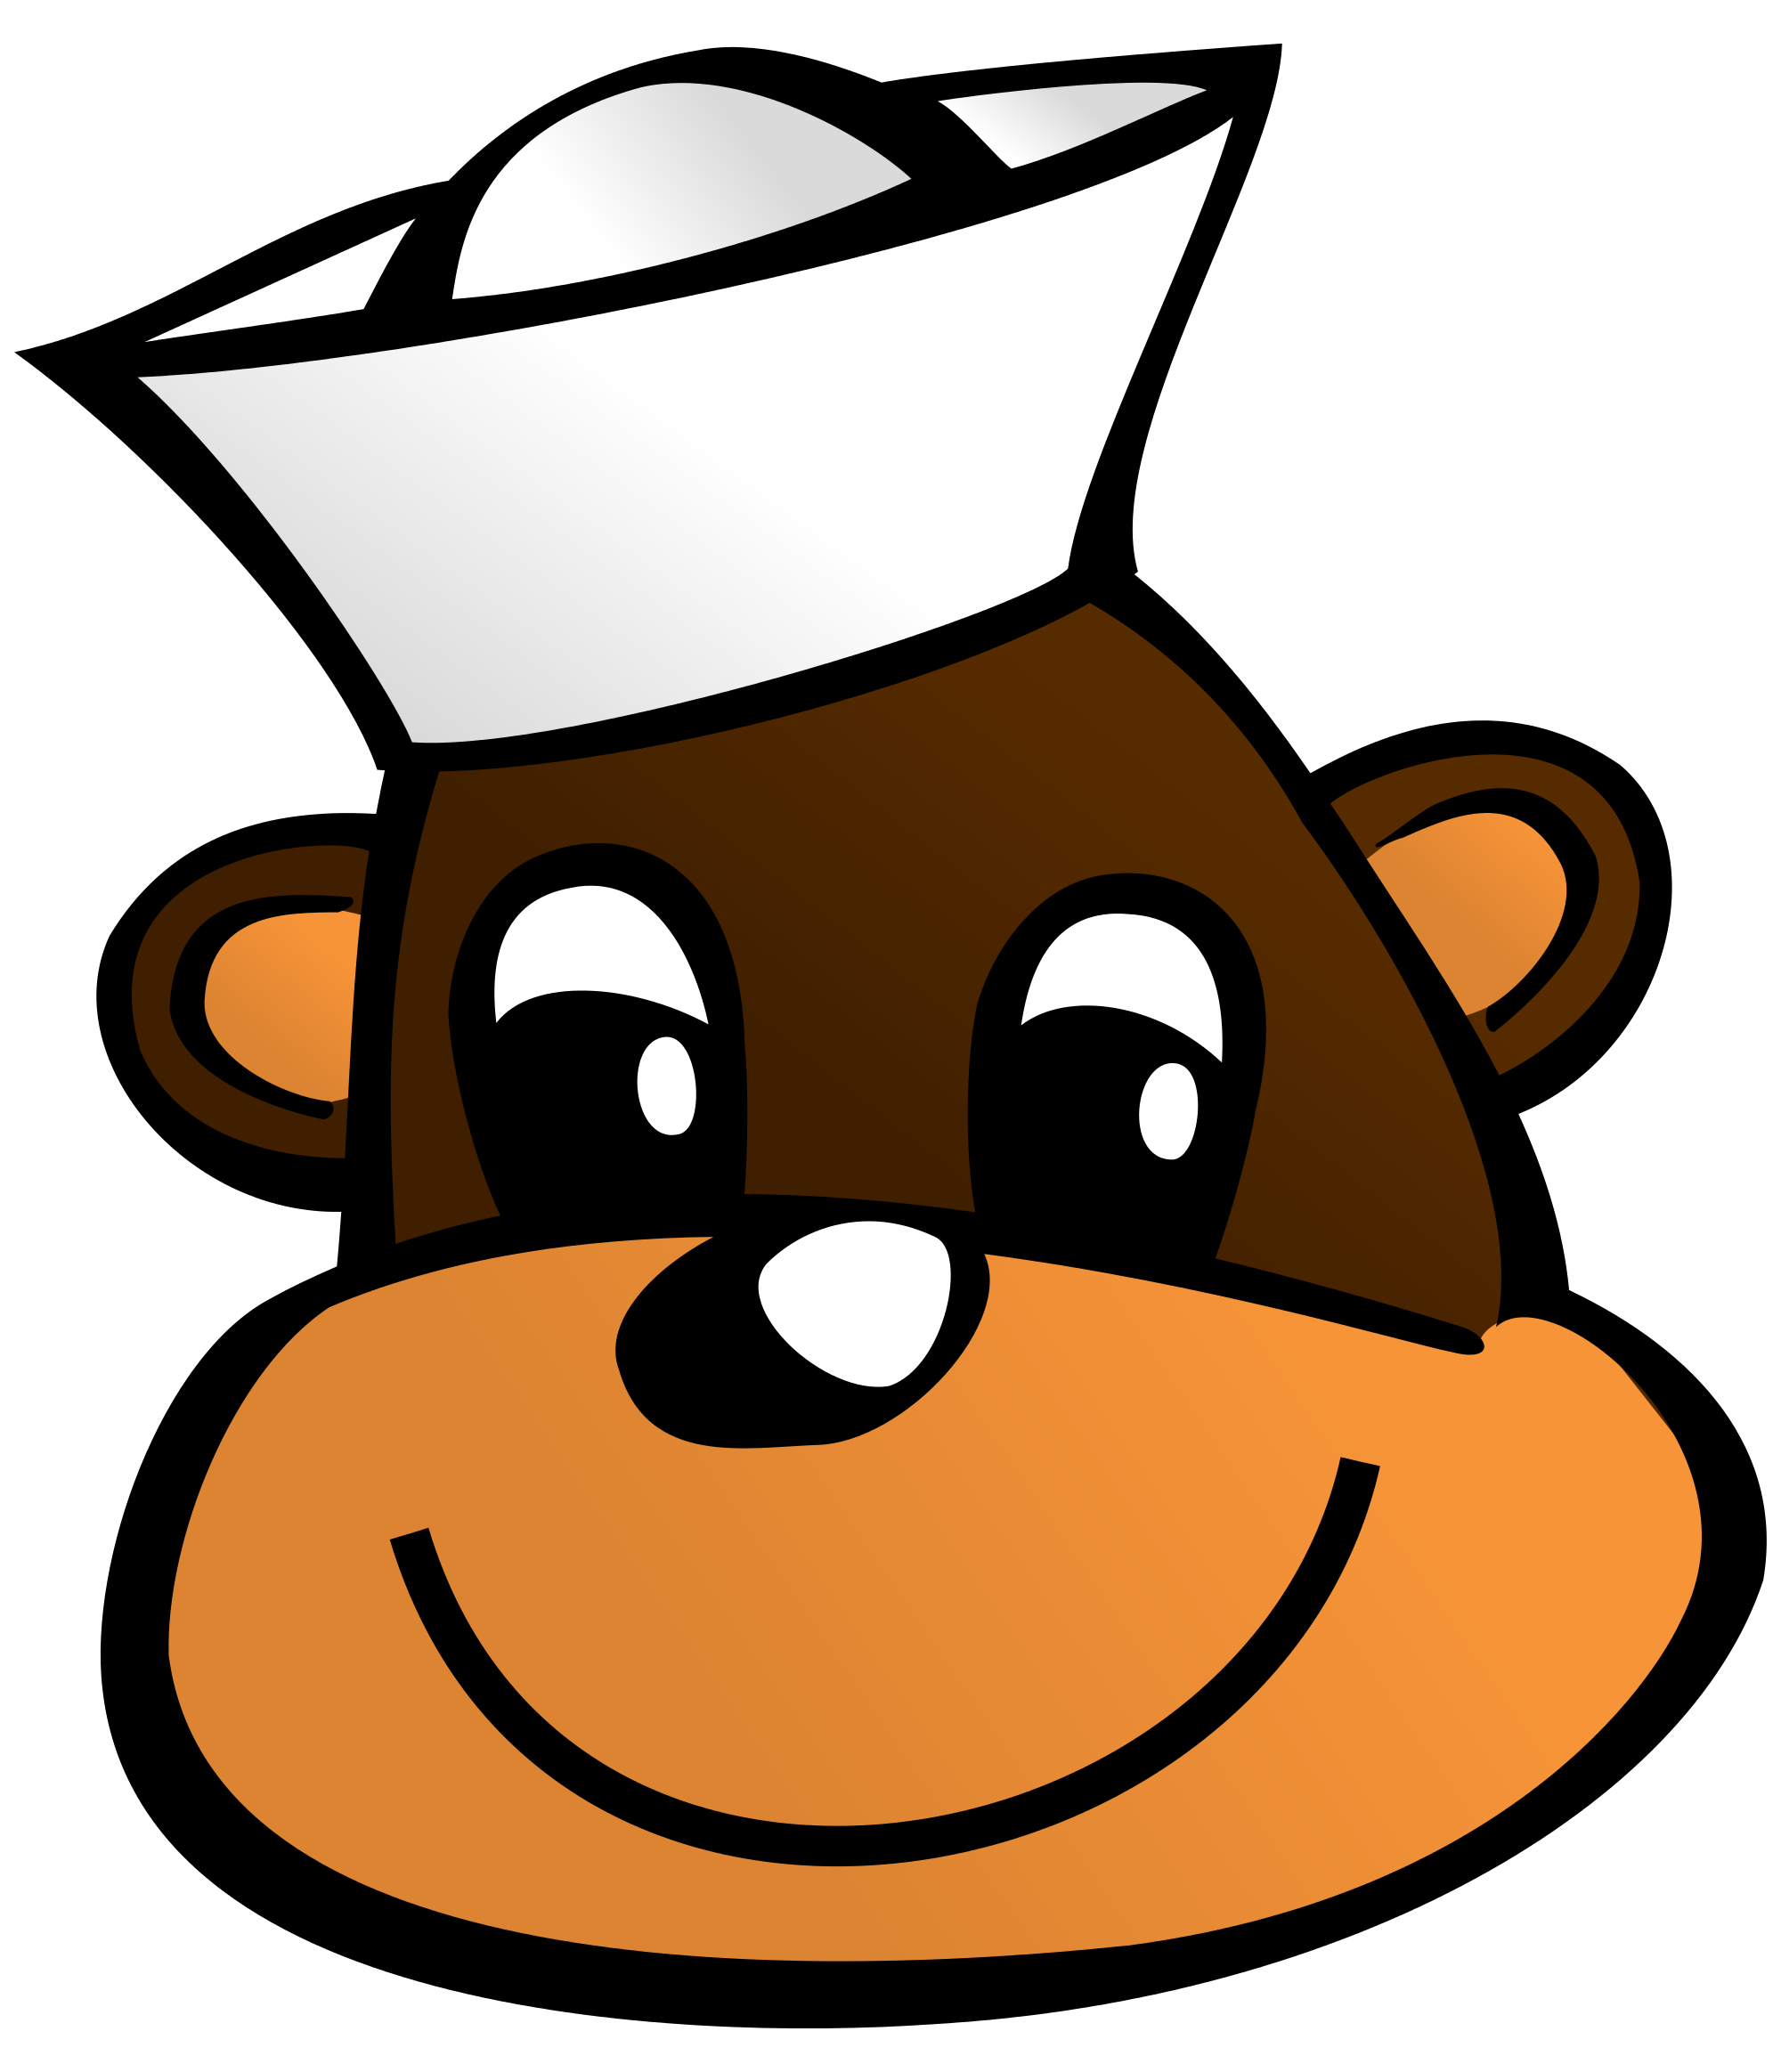 Sailor clipart salior. File monkey svg wikimedia